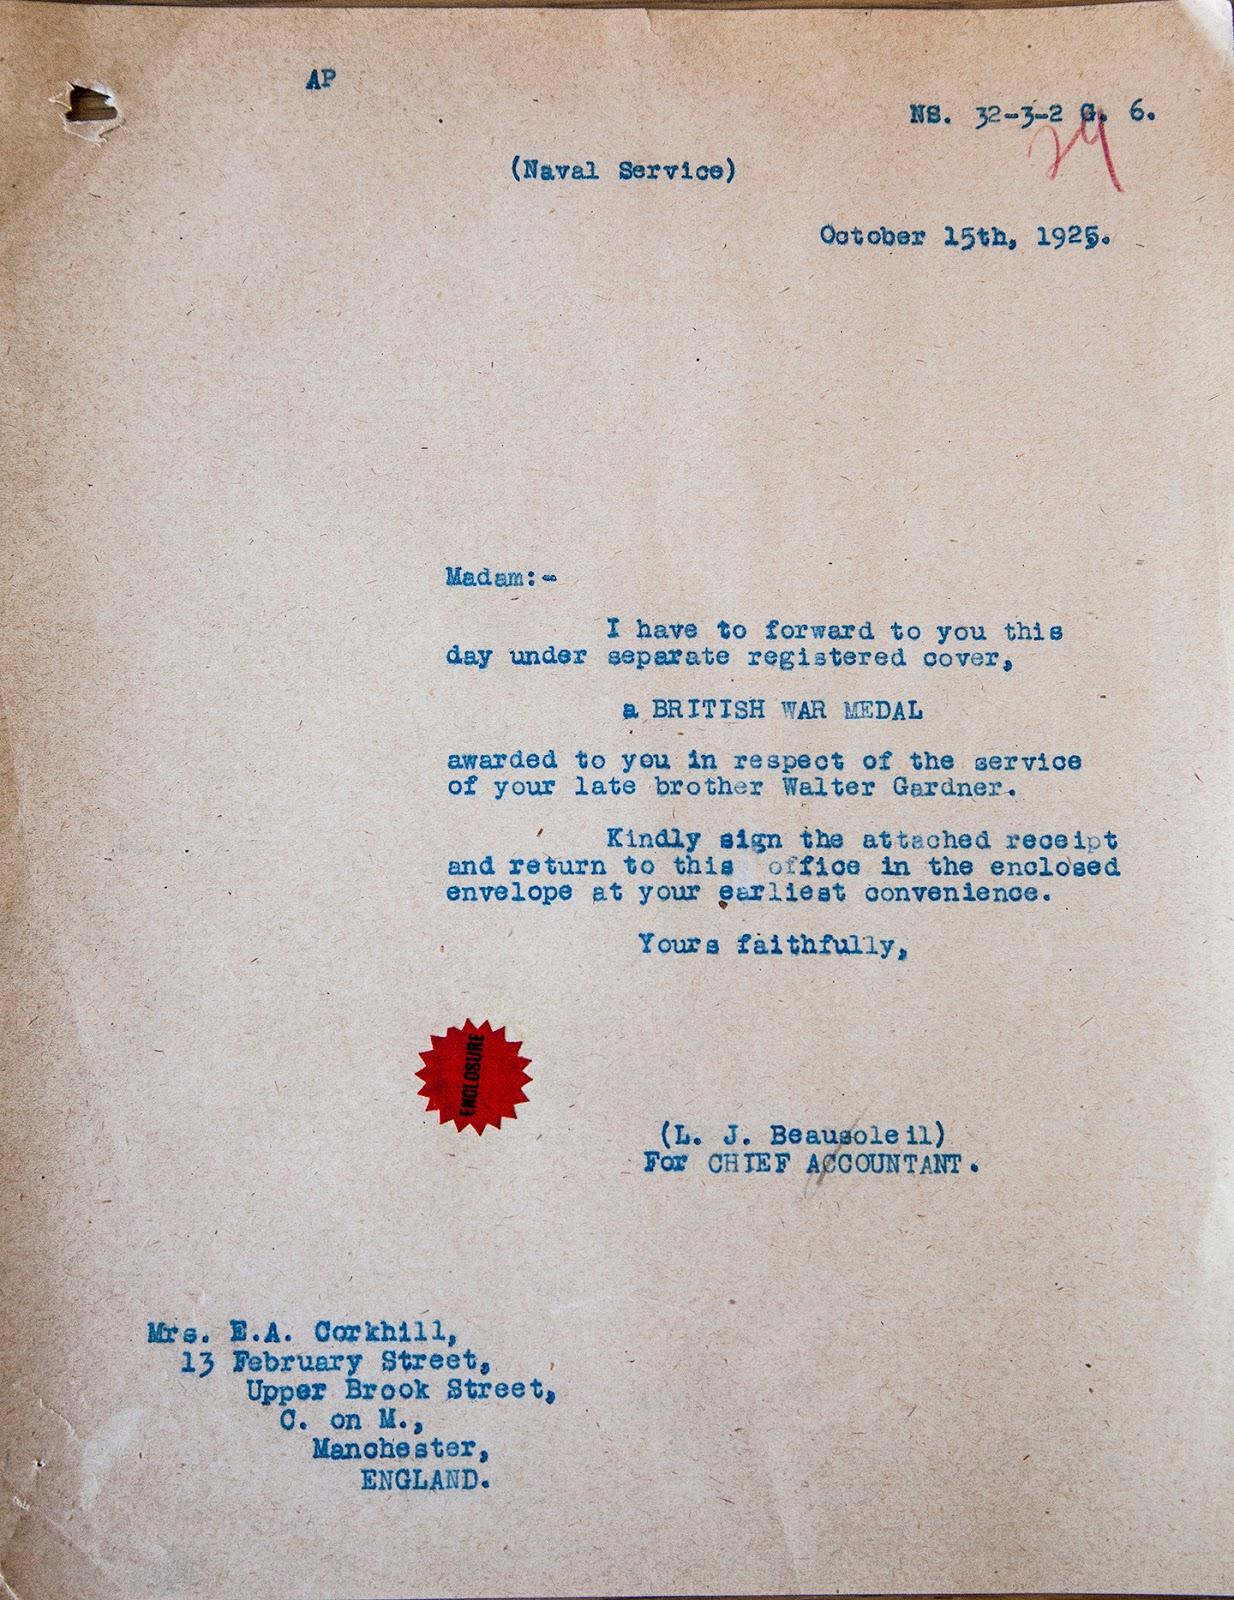 Letter– Letter accompanying Walter Gardner's World War I British War Medal (posthumously awarded).